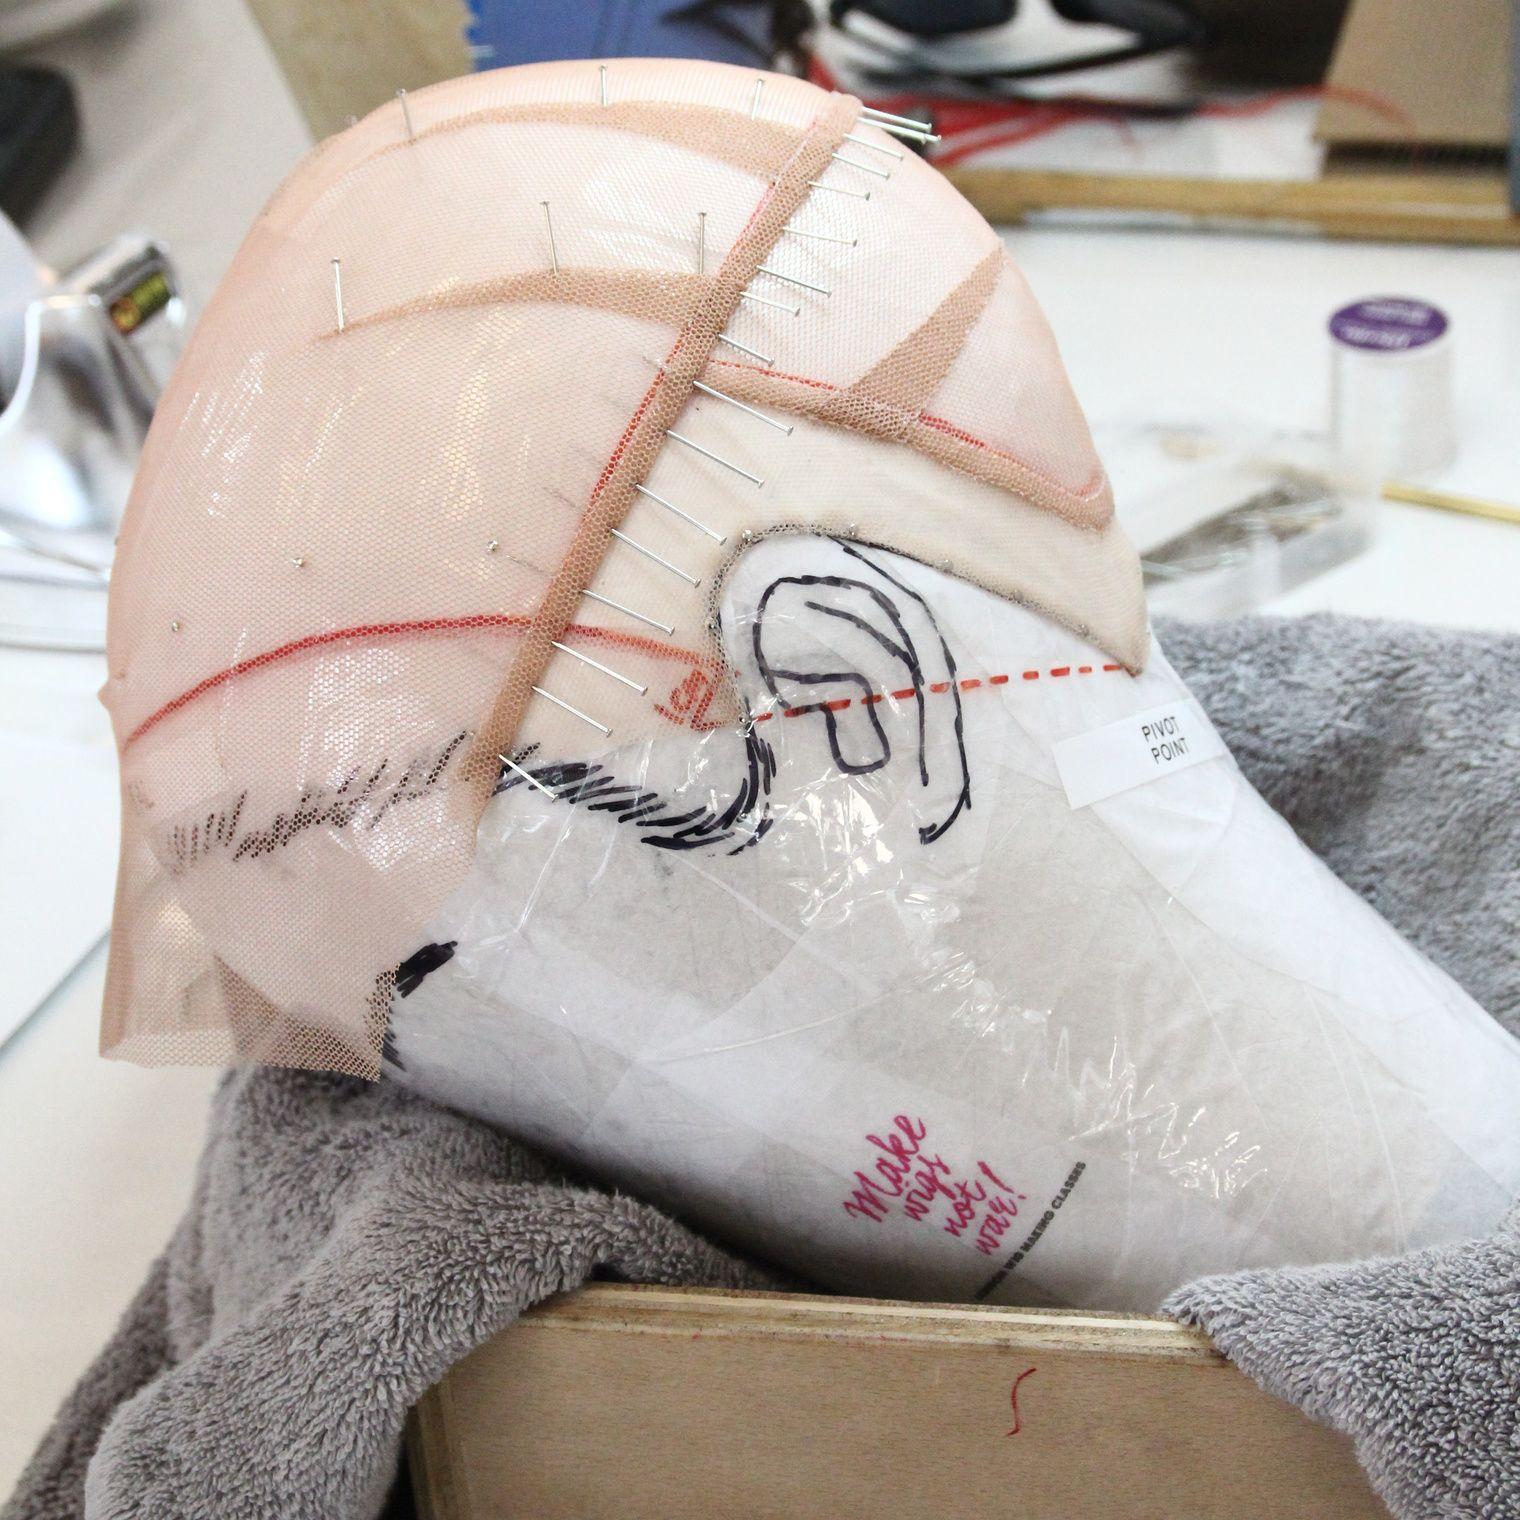 Foundation making wig master wigs postiche ltd wigs